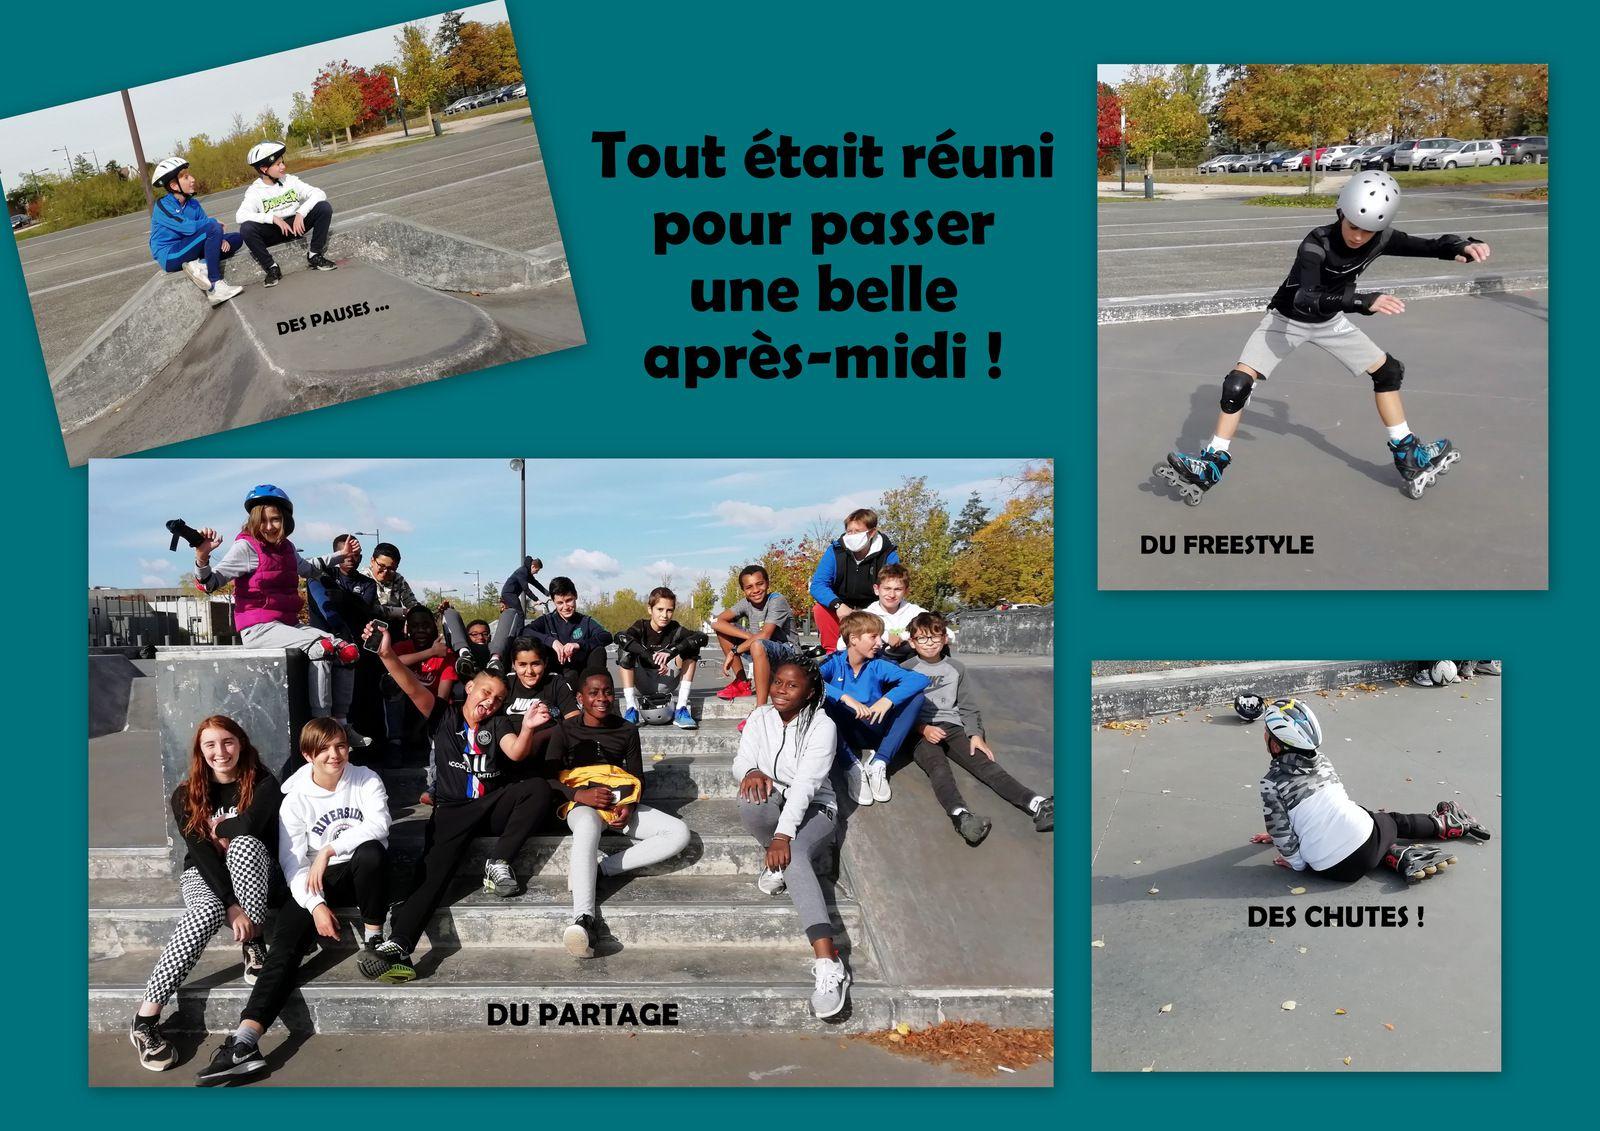 Sortie au skate park - Mercredi 14 Octobre